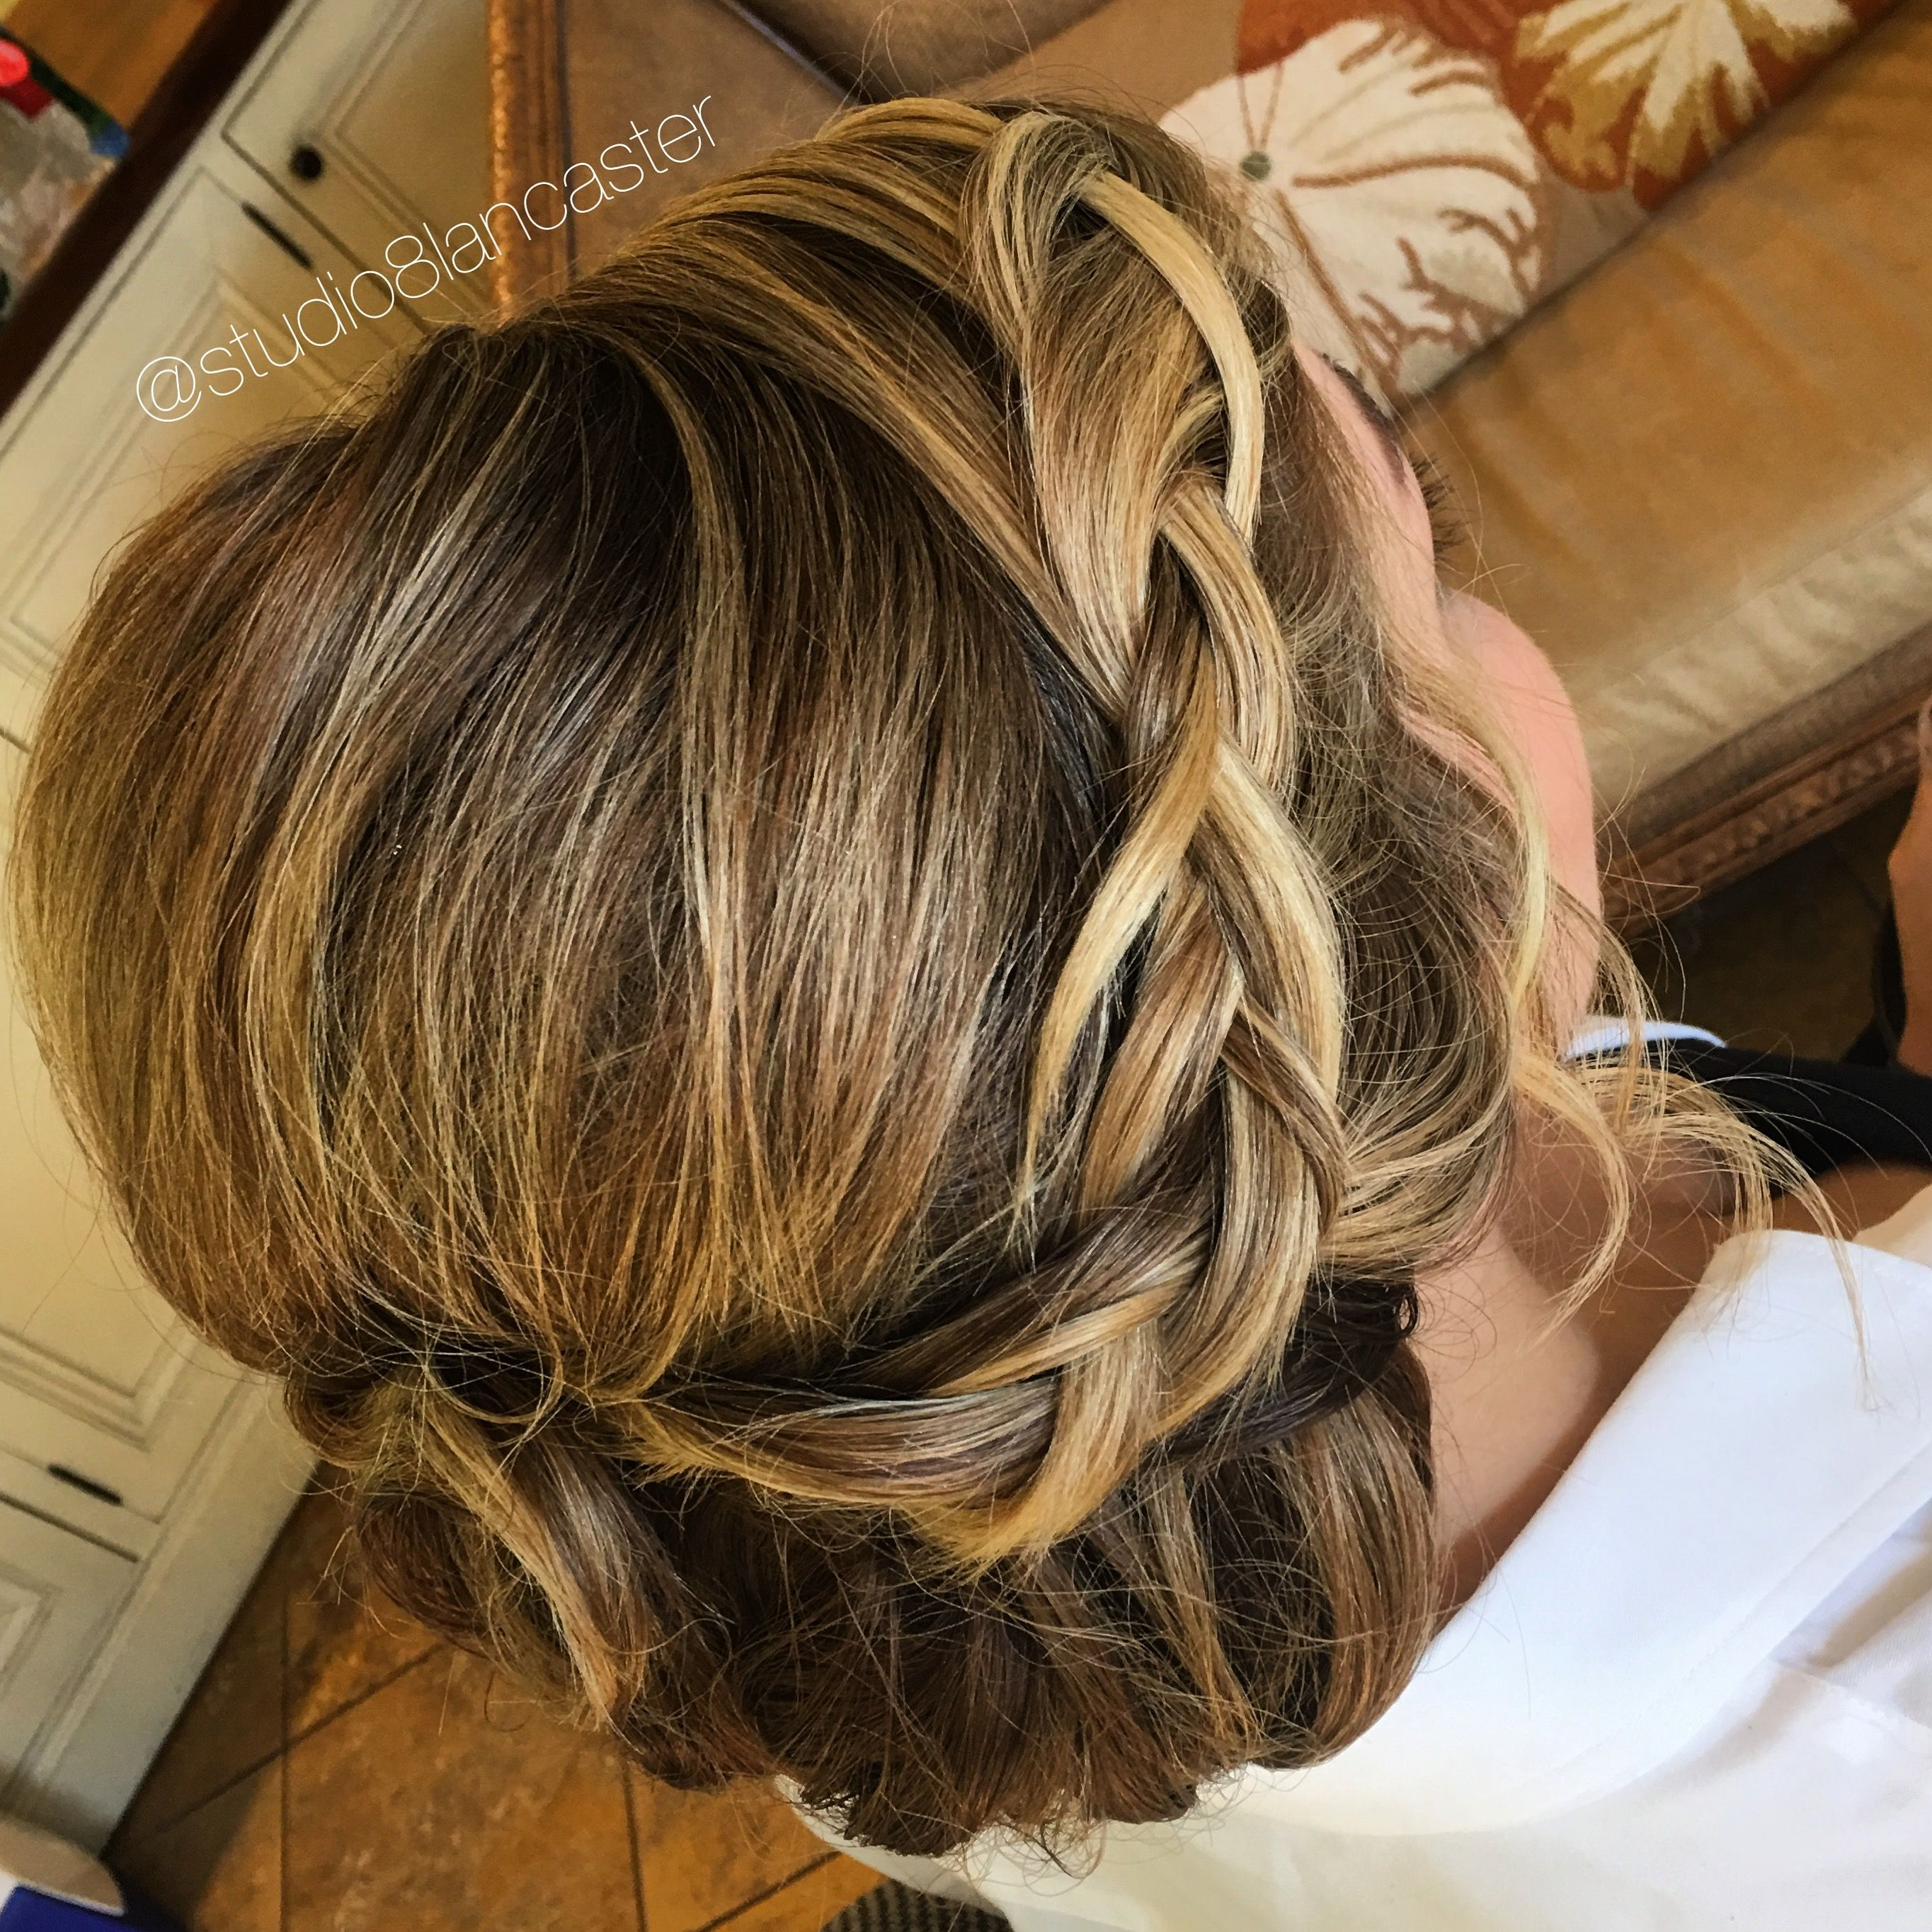 Braided bridesmaid updo romantic undone hairstyle Fall wedding